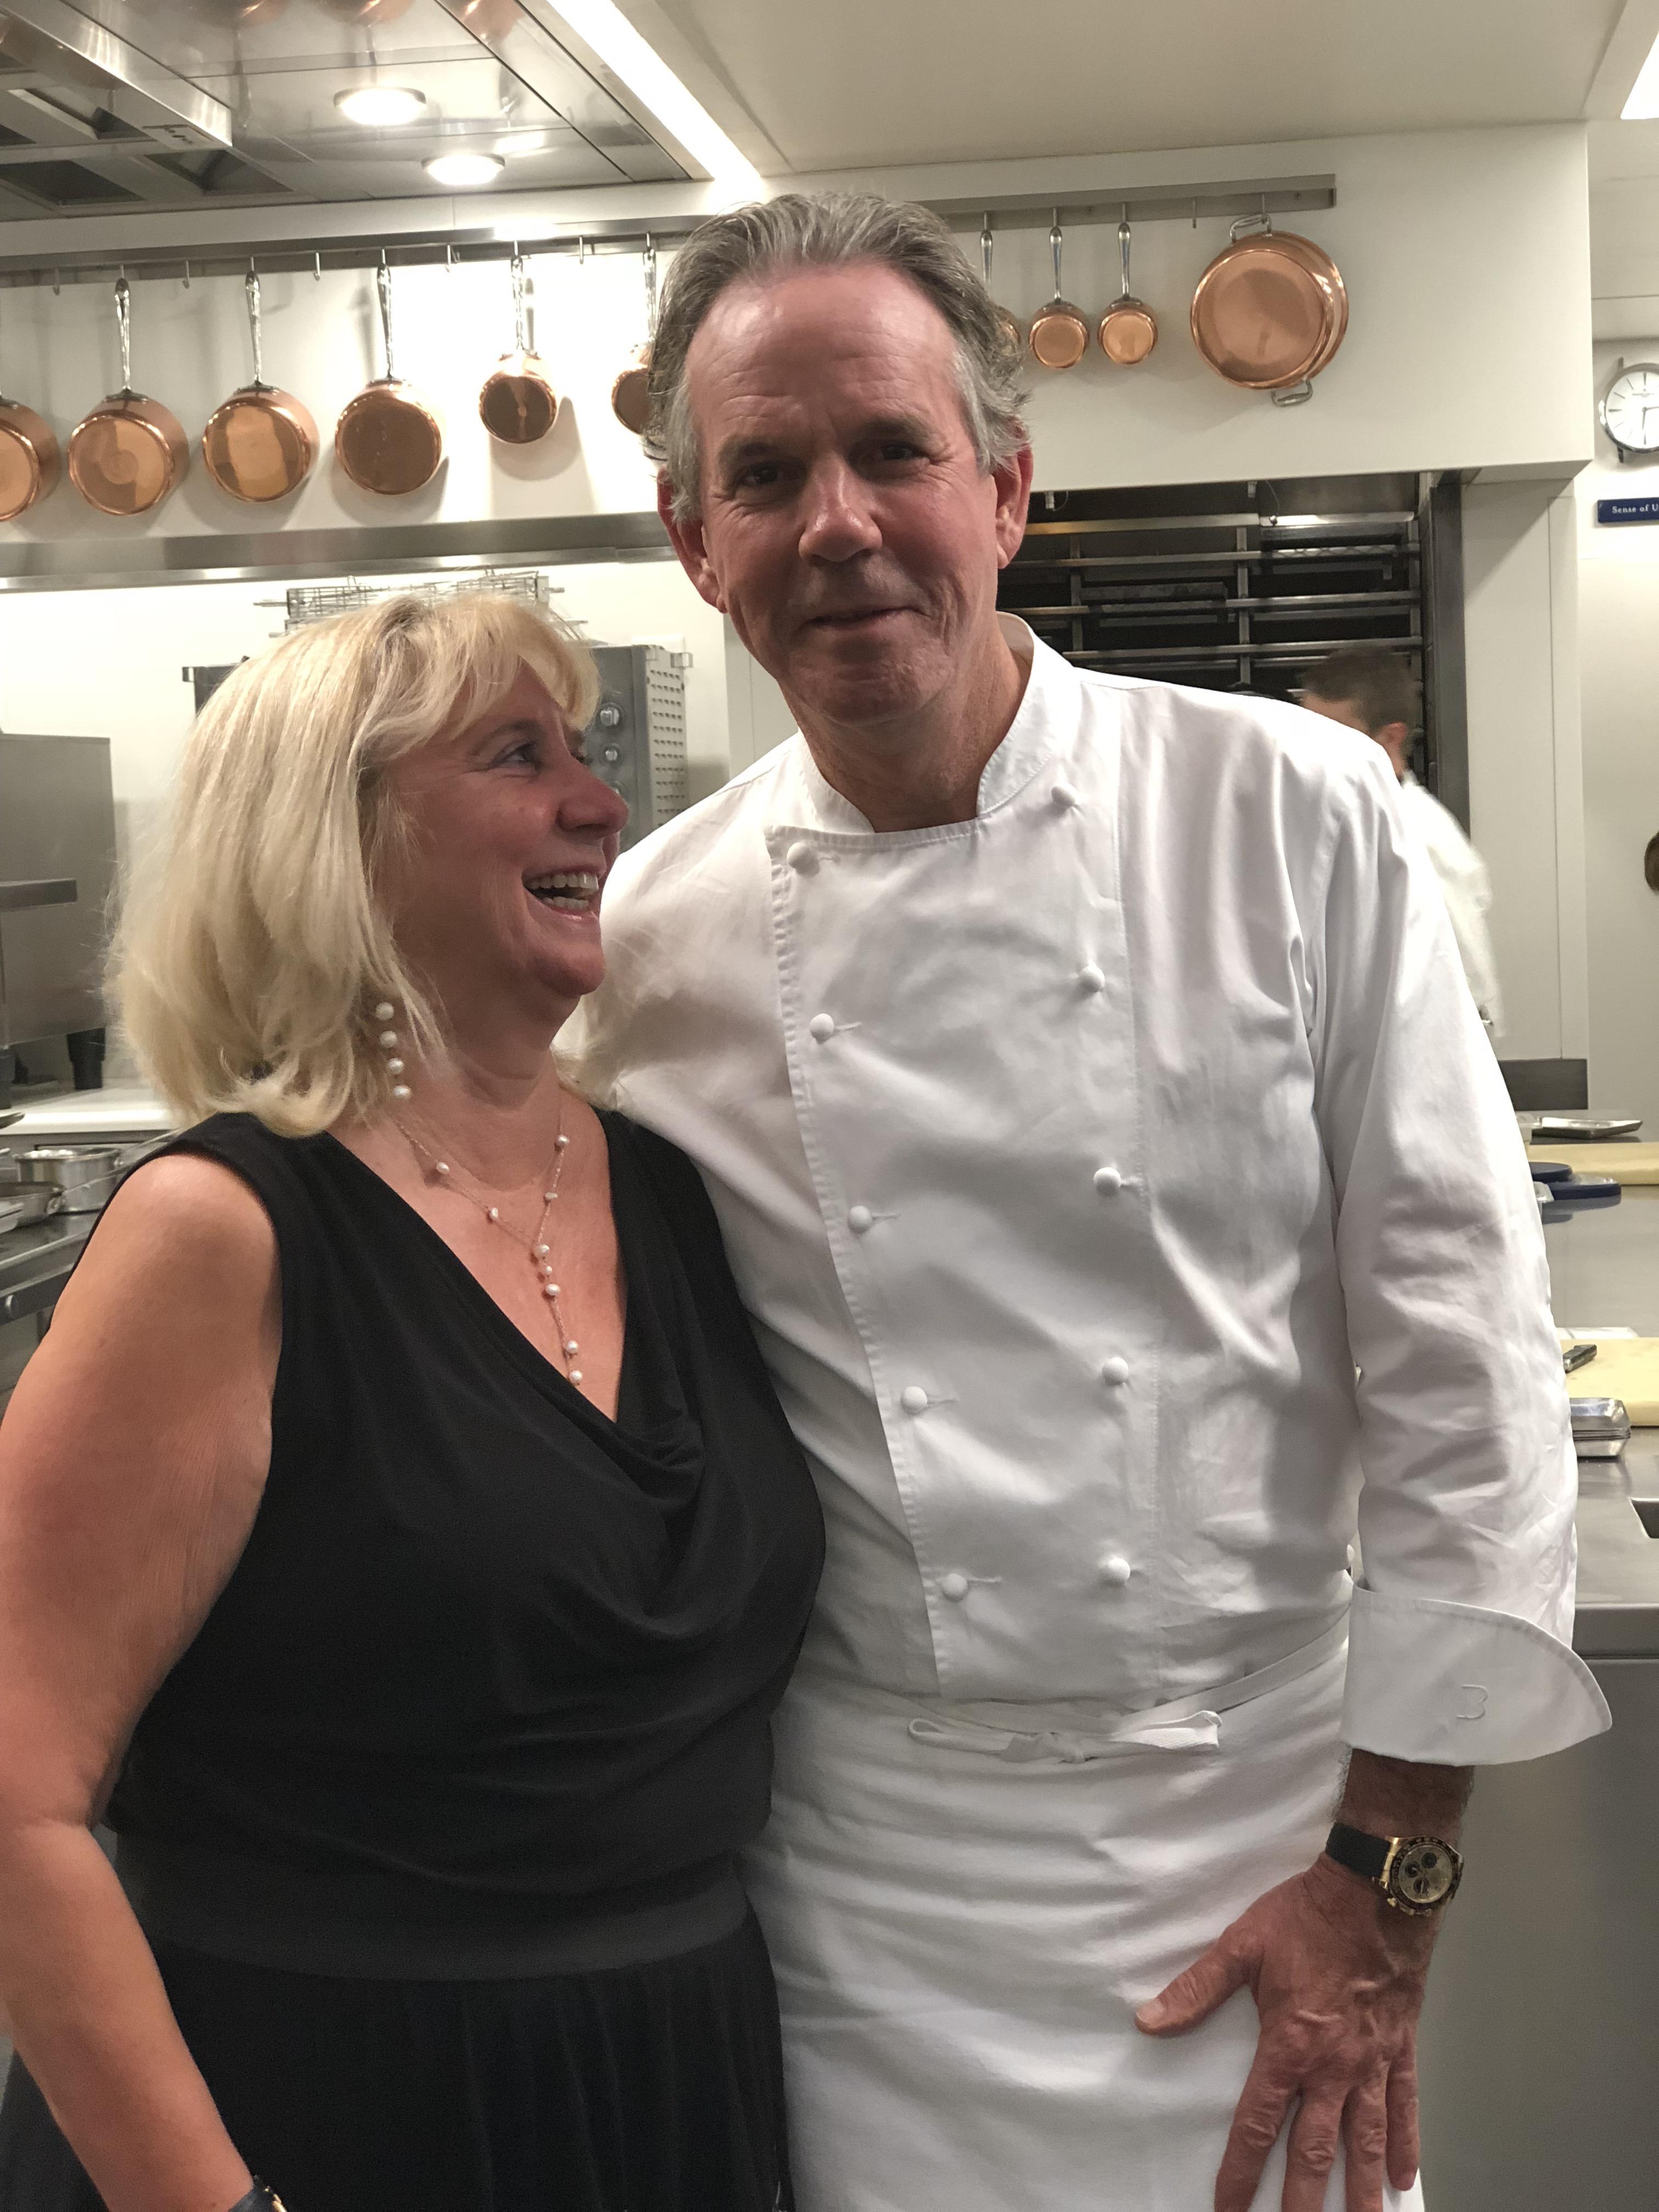 Meeting Chef Thomas Keller